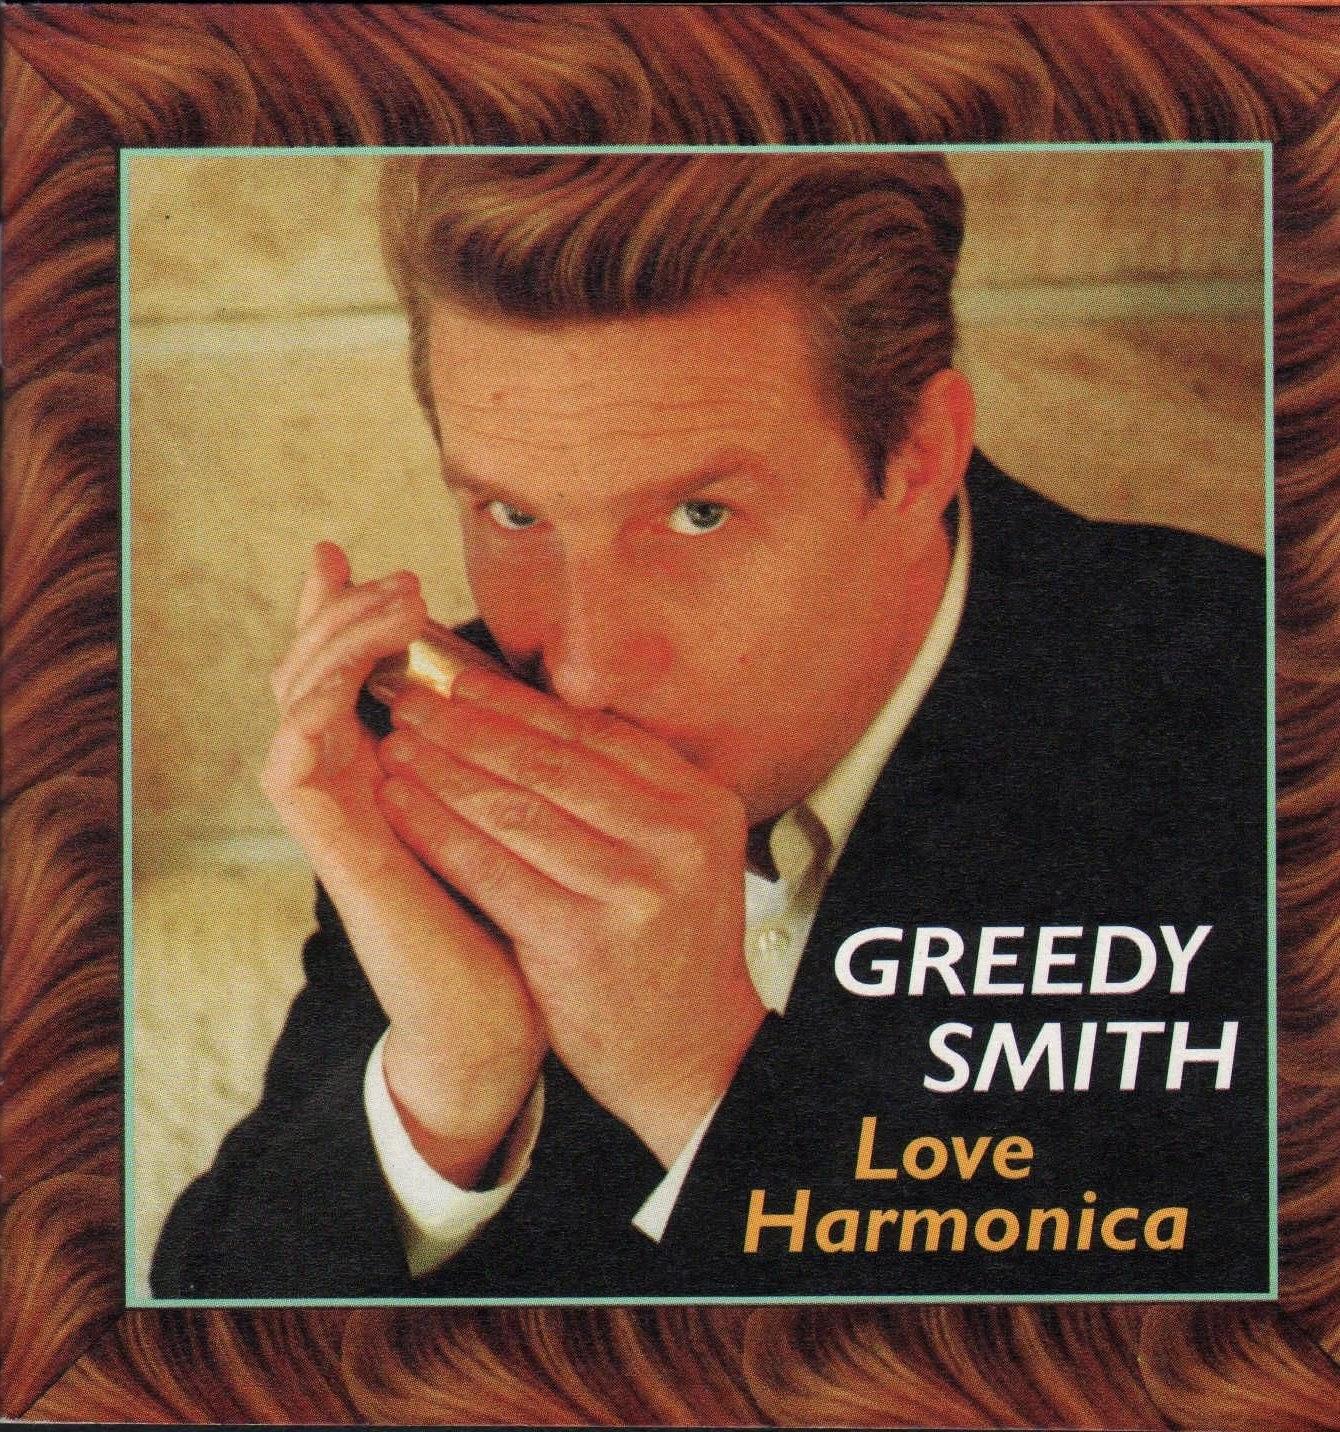 Ozzie Music Man Post 536 Greedy Smith Love Harmonica Lp